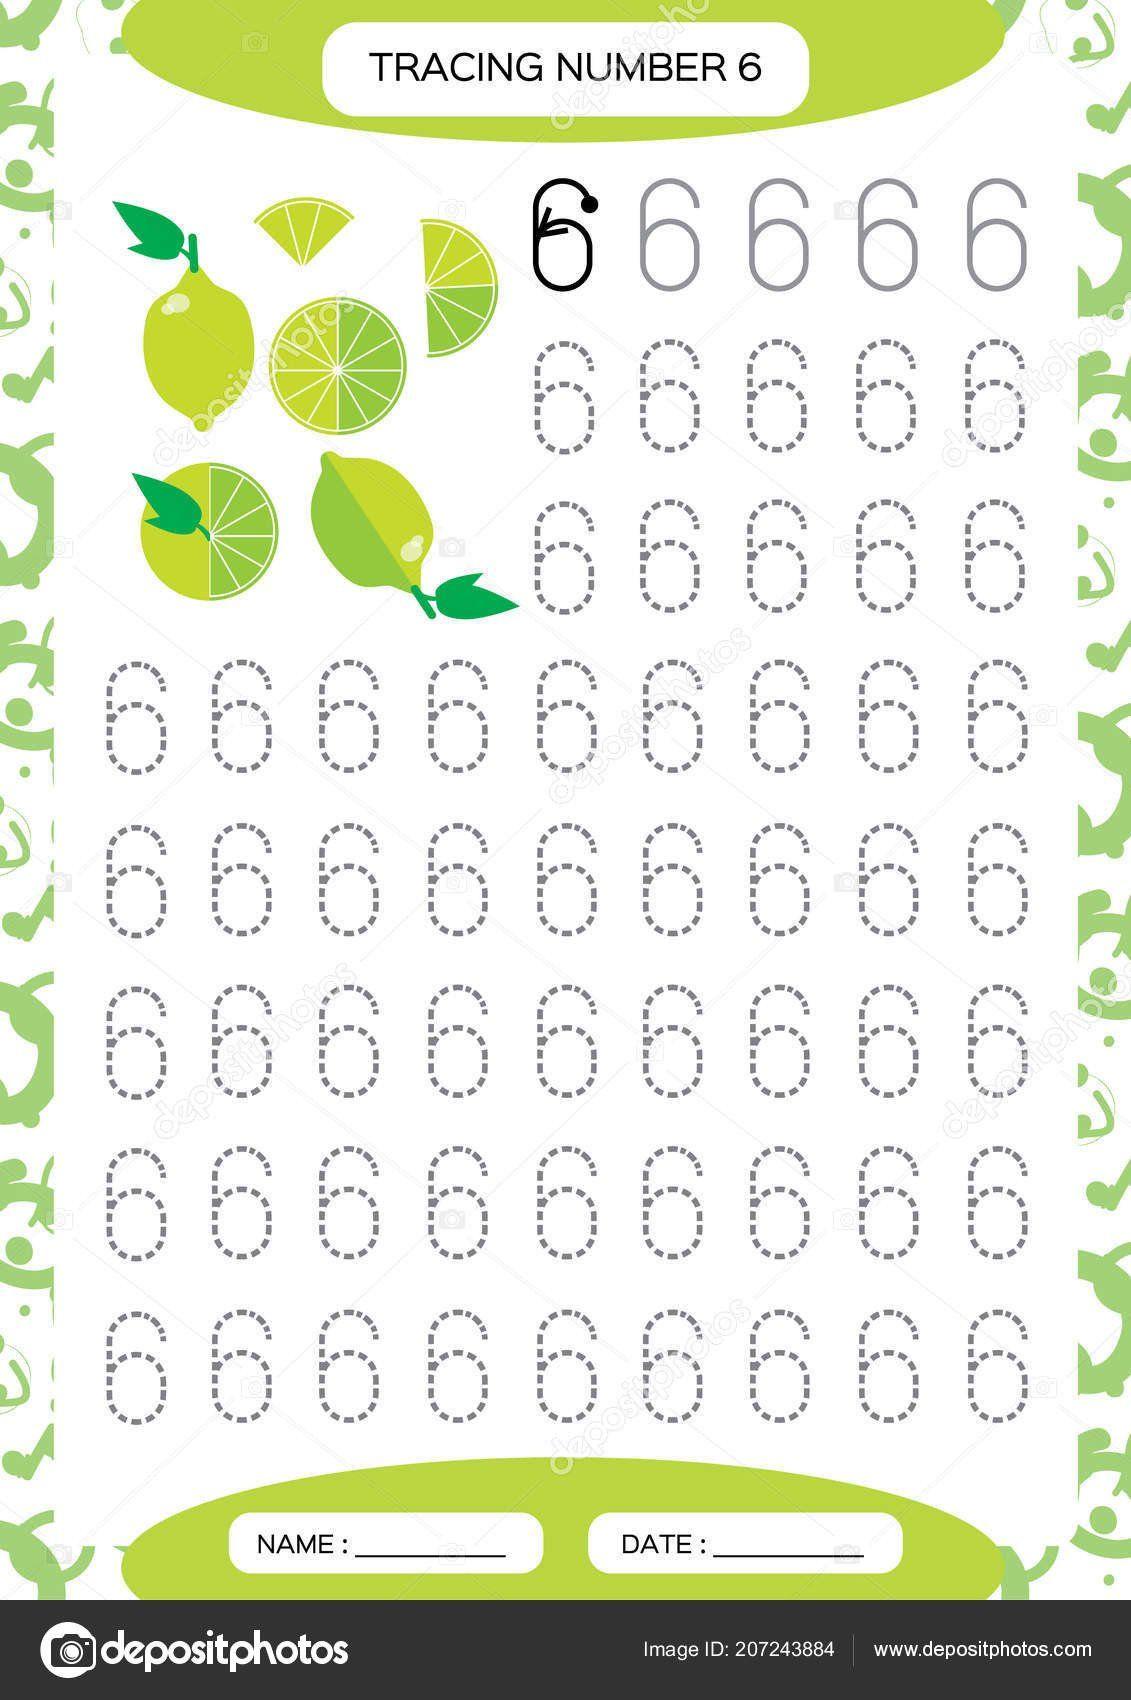 Number 6 Worksheet Preschool Clipart Number 6 Tracing In